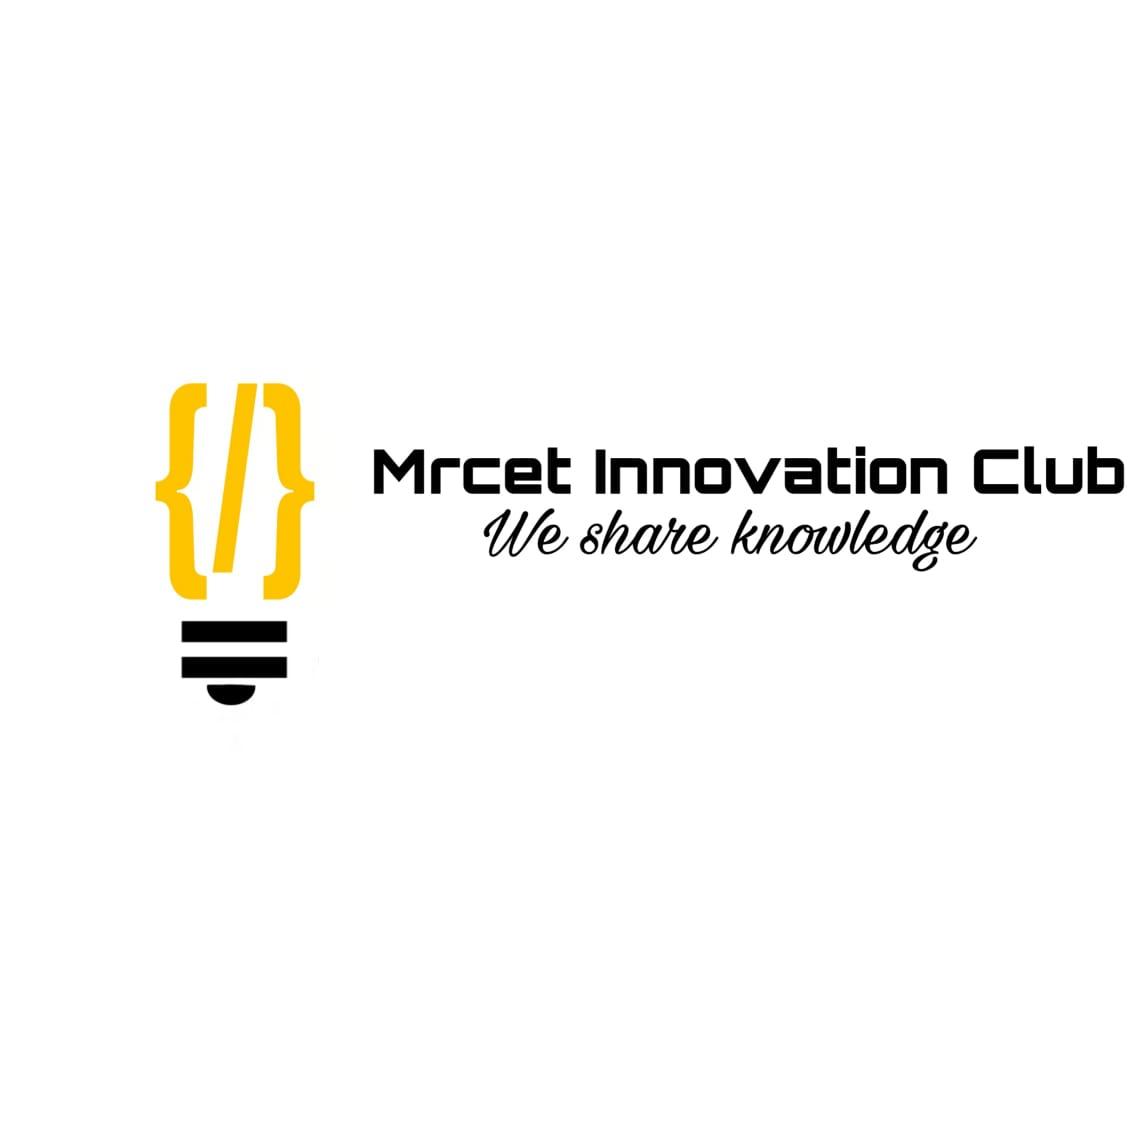 logo1.jpeg